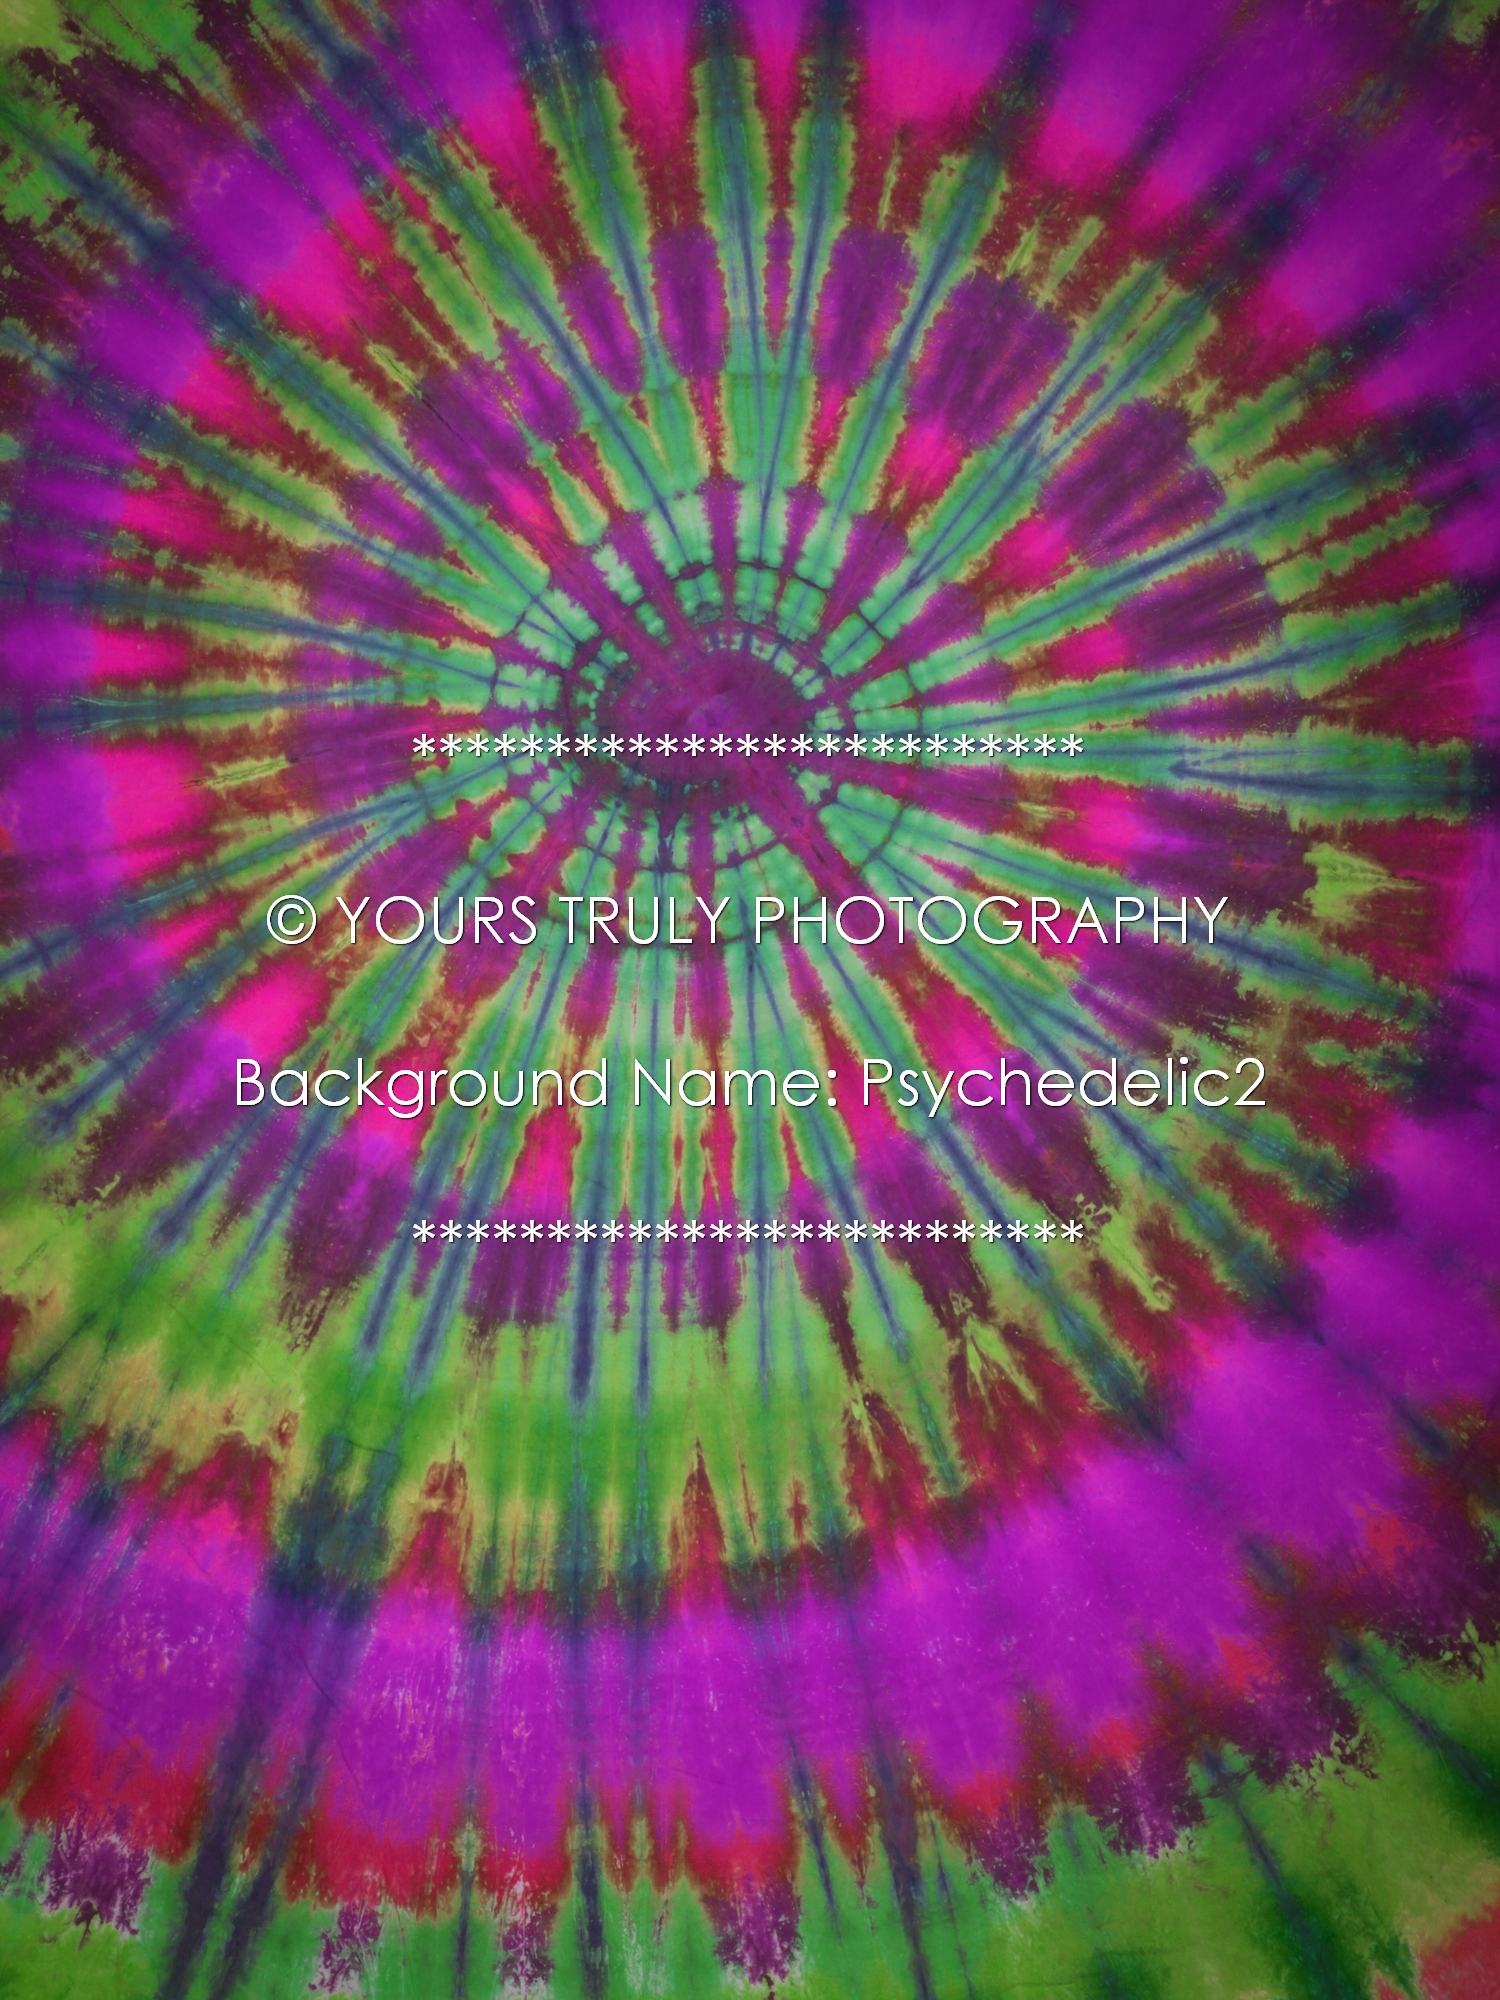 Psychedelic2.jpg